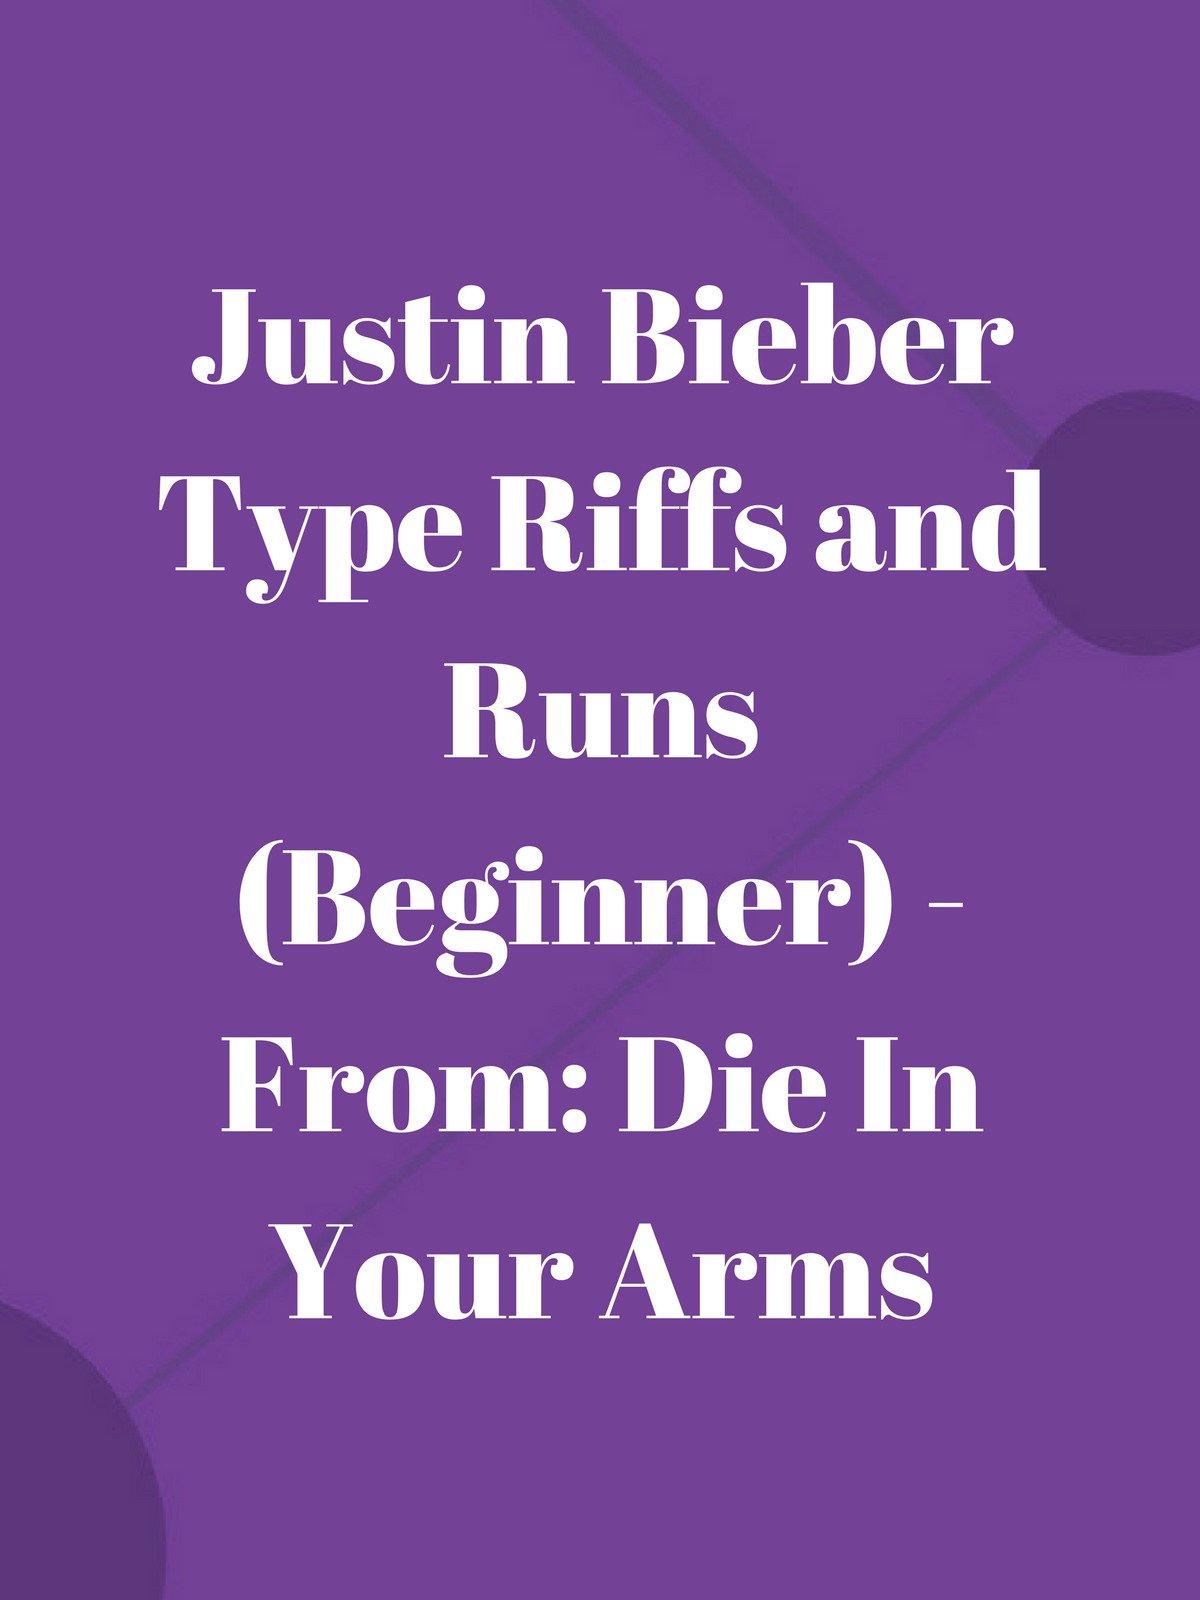 Justin Bieber Type Riffs and Runs (Beginner)